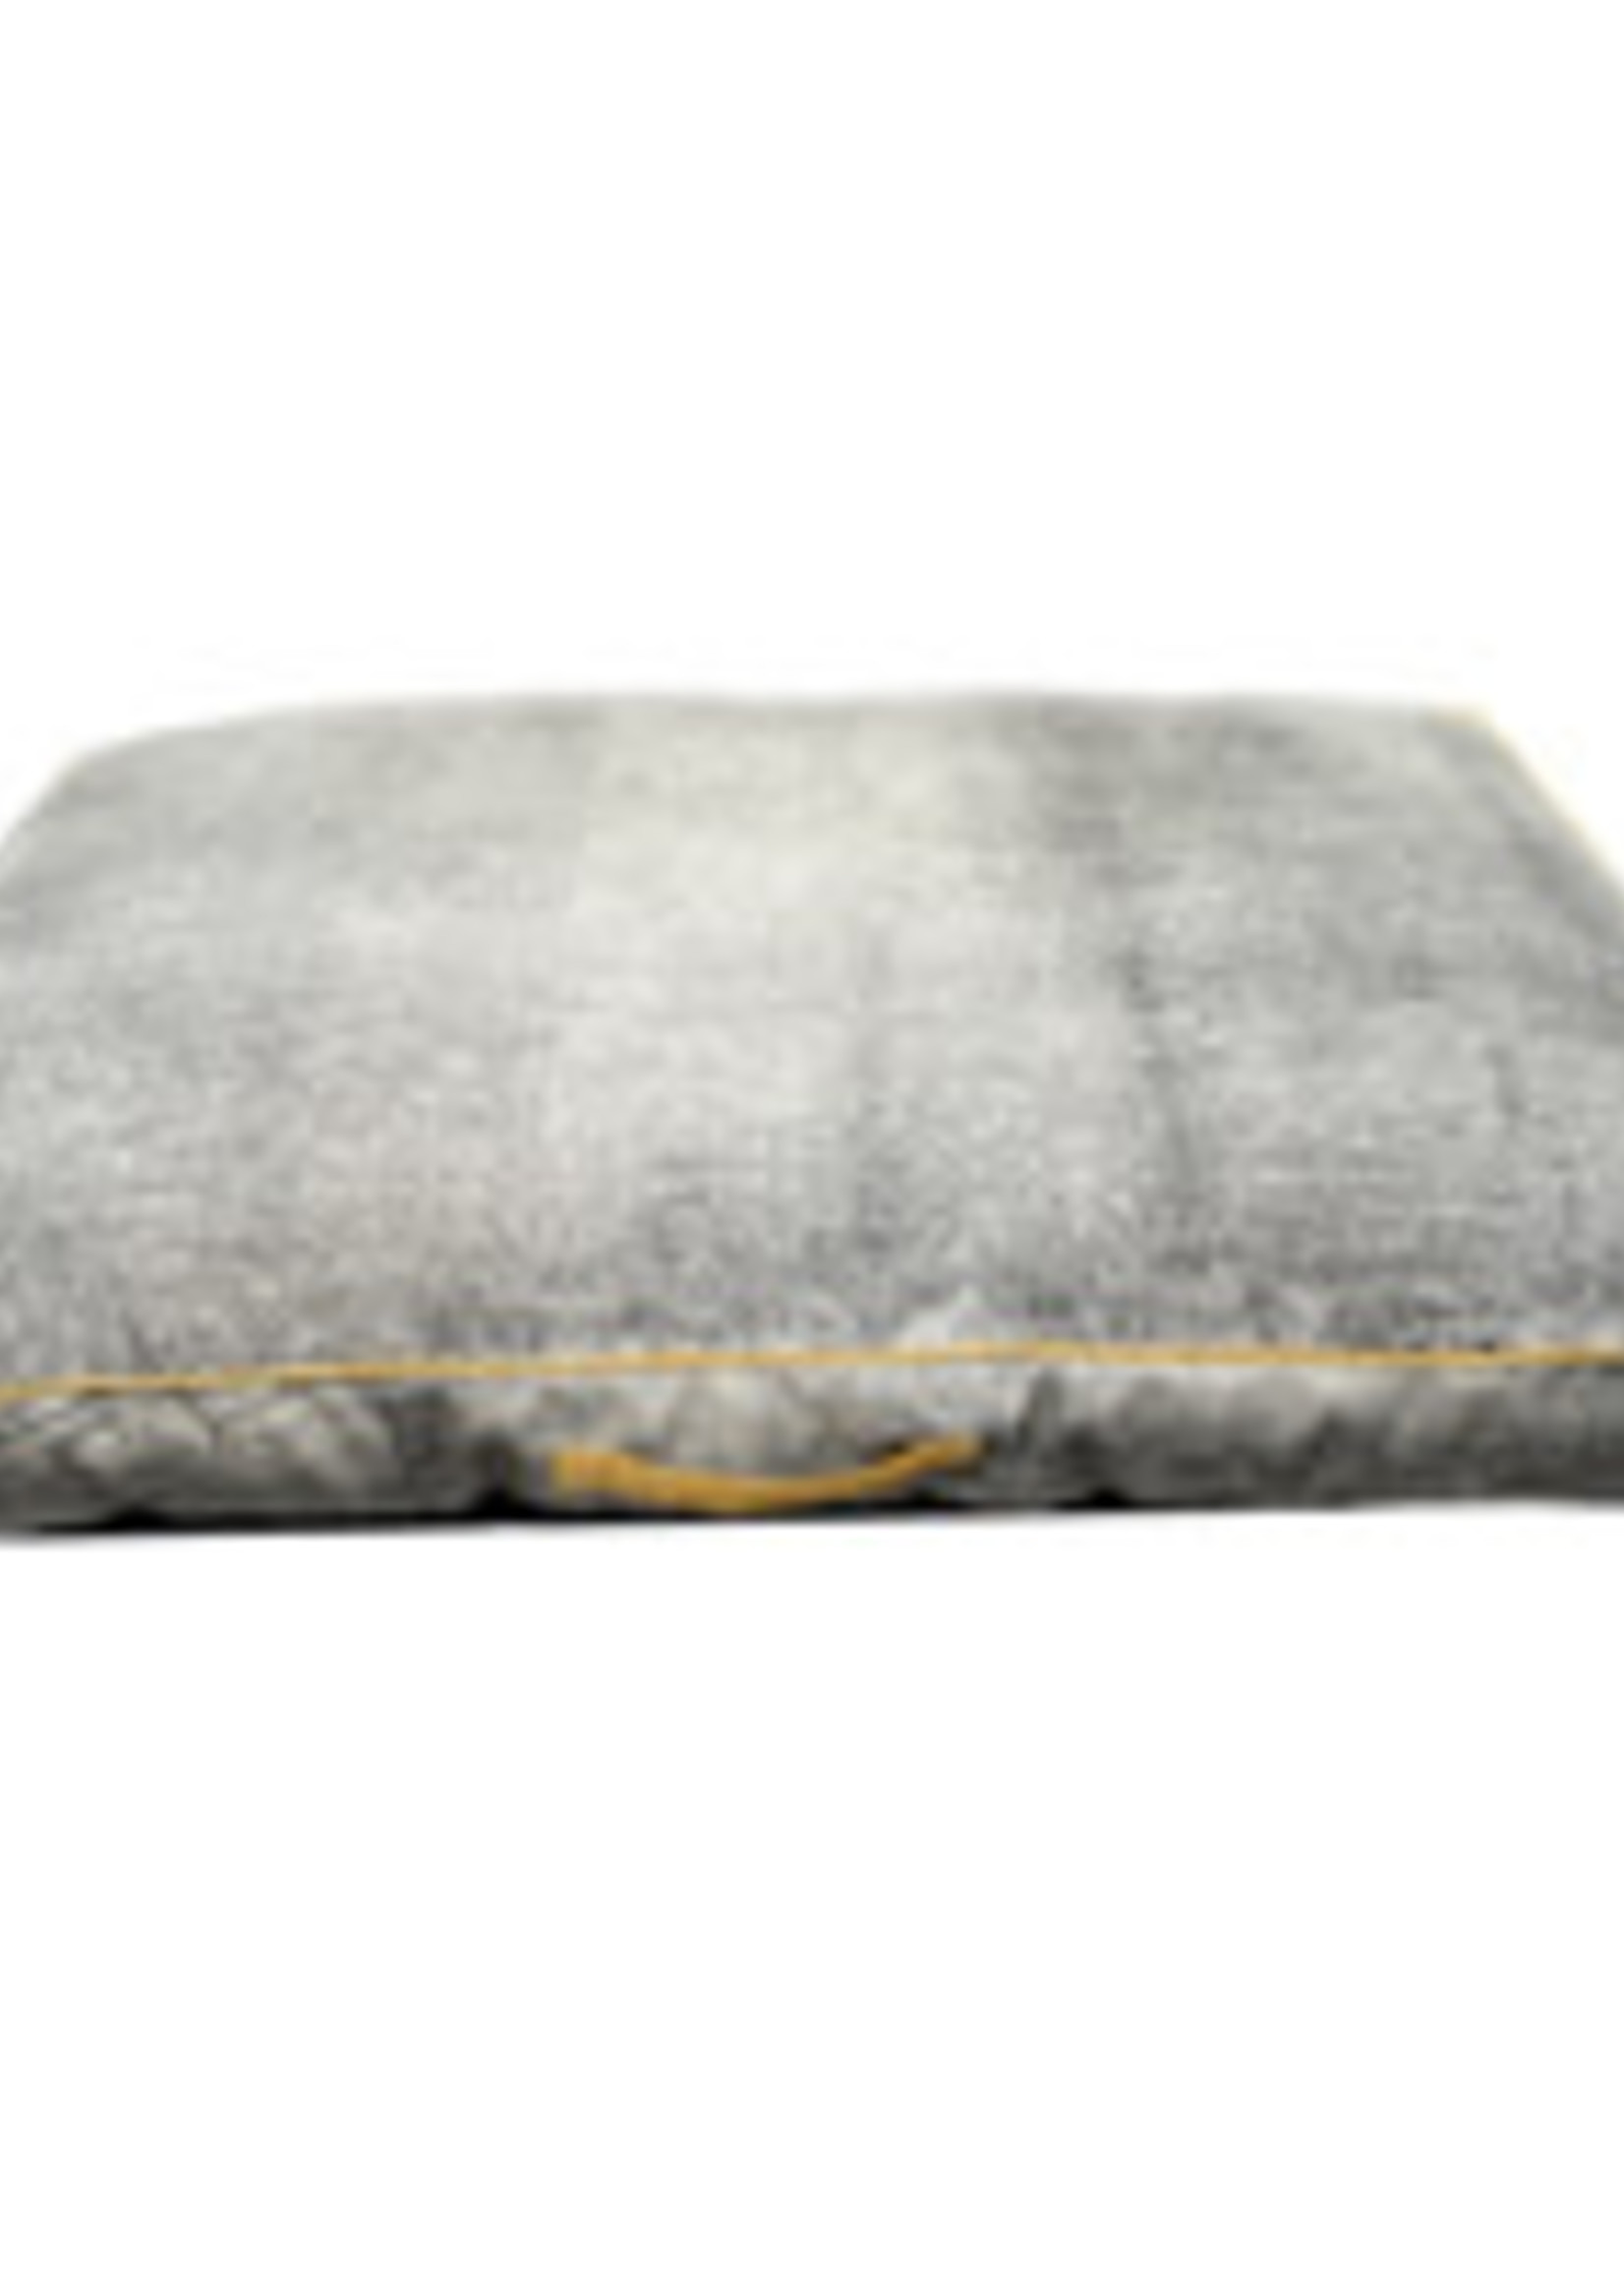 Resploot Resploot Mattress - Rectangular - Grey Smoke - 120 x 80 x 12 cm (47 x 32 x 5 in)